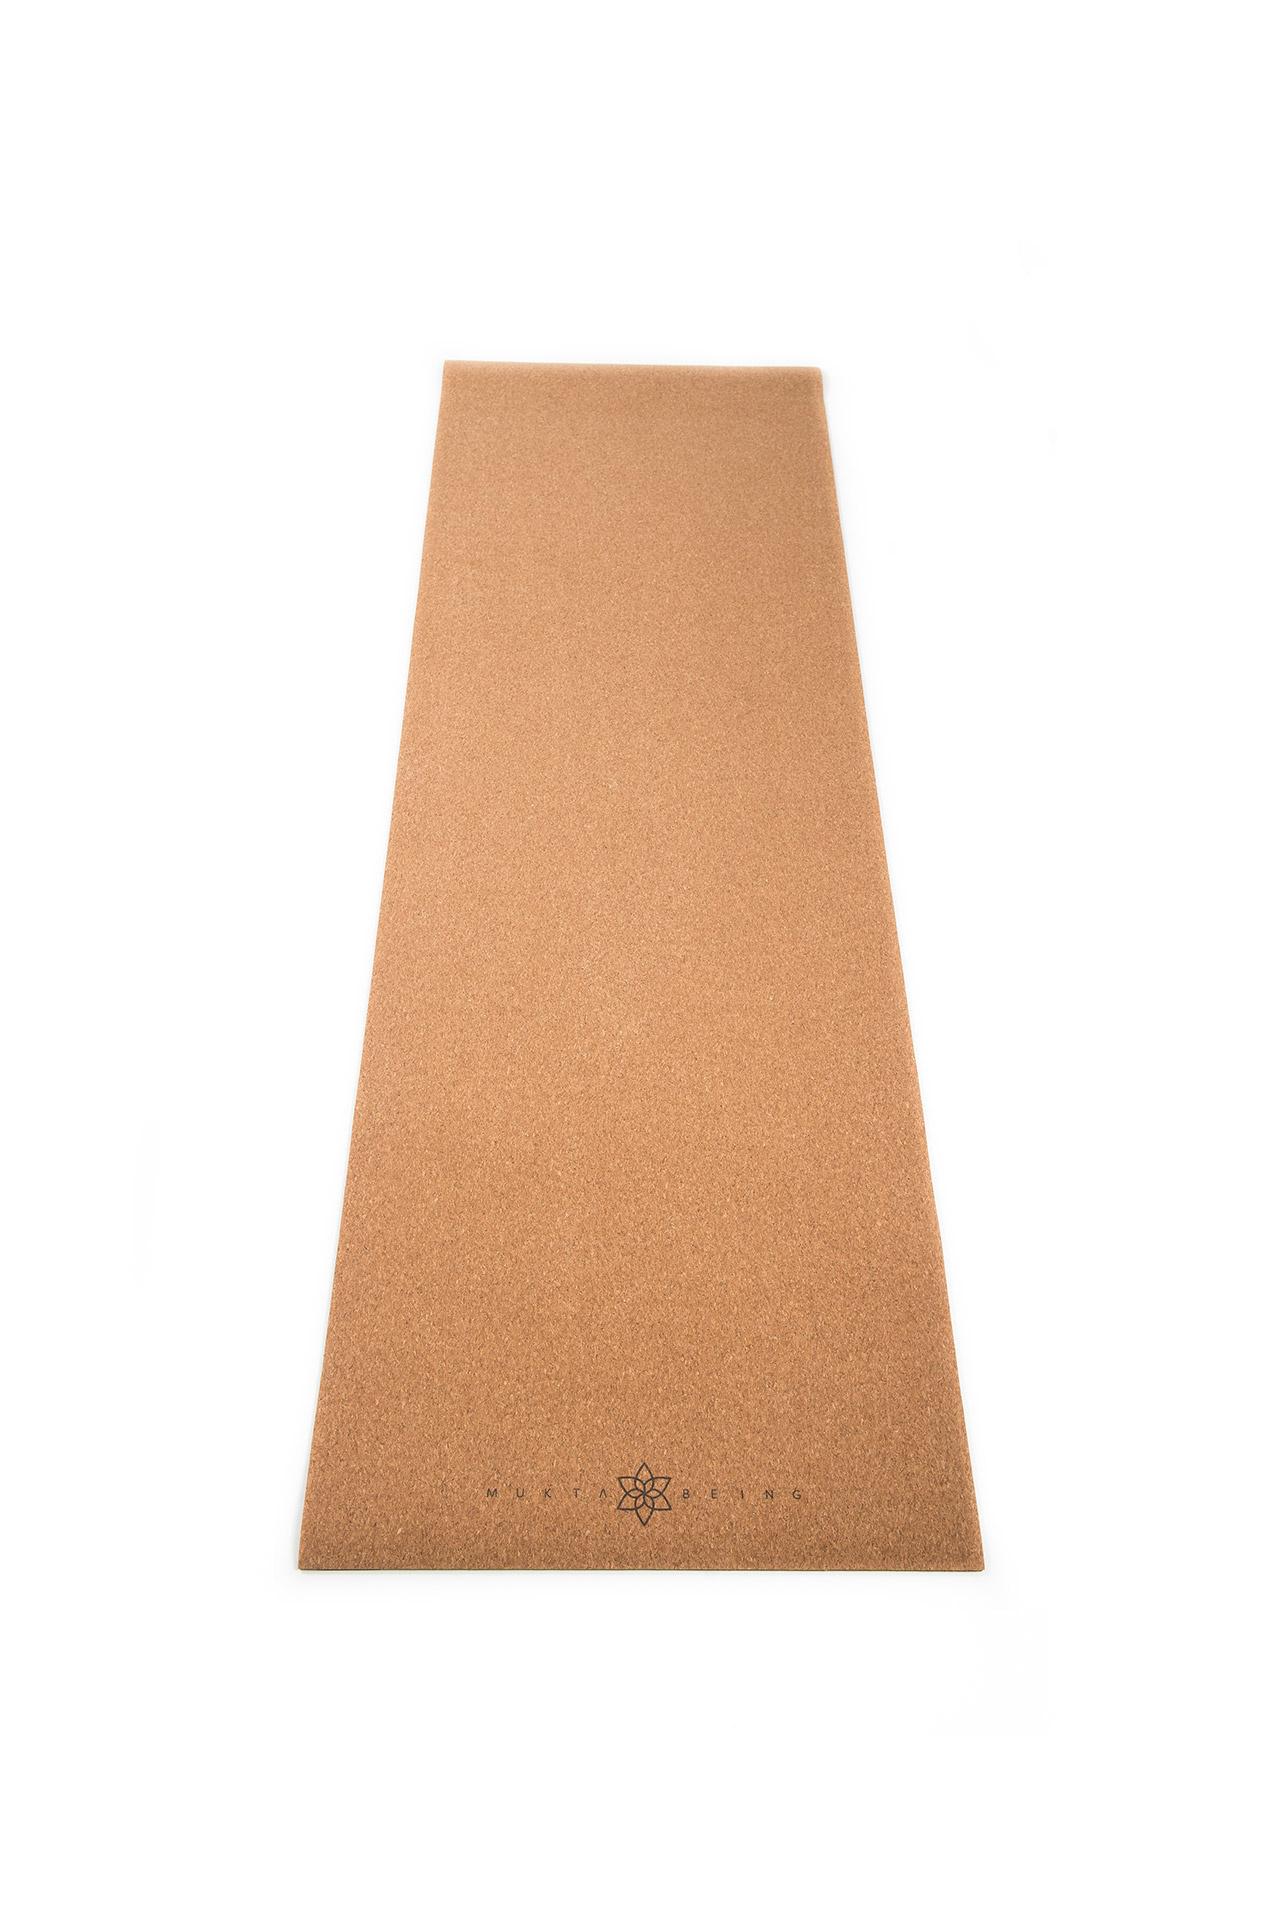 MUKTA BEING Mukta Cork Yoga Mat